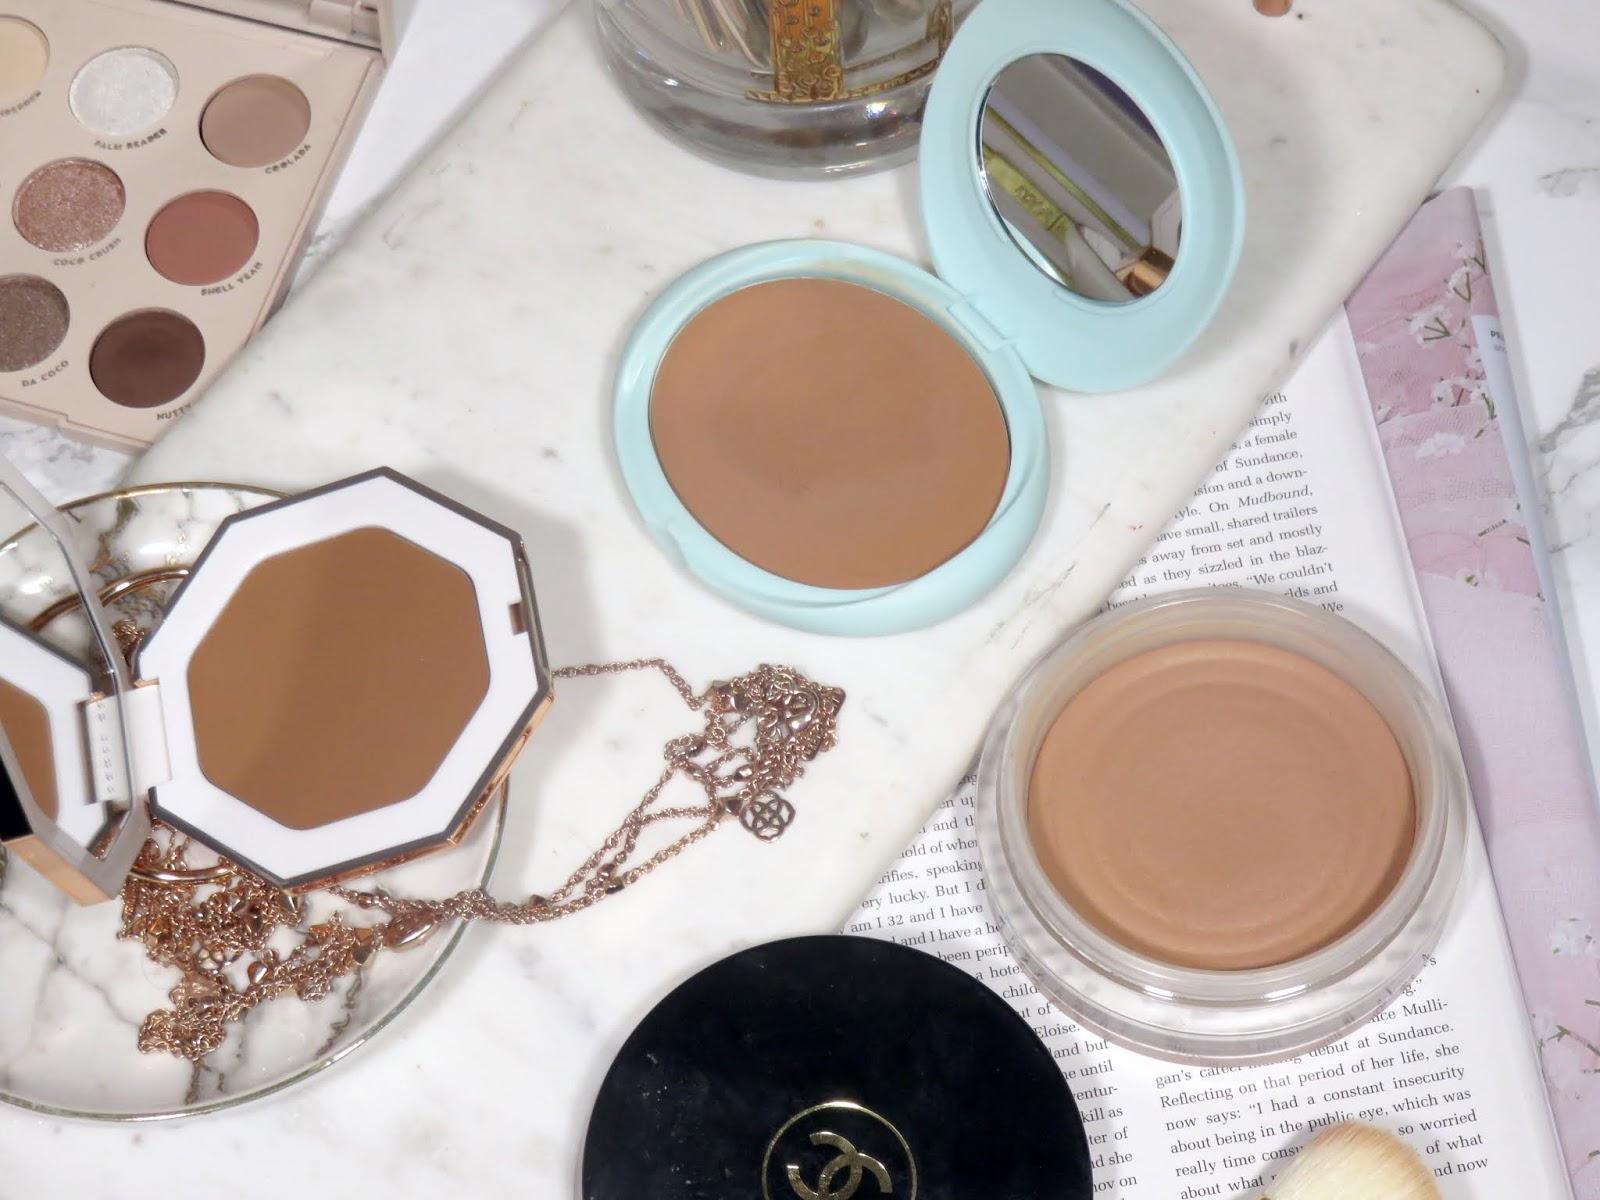 Tarte SEA Breezy Cream Bronzer Review & Swatches